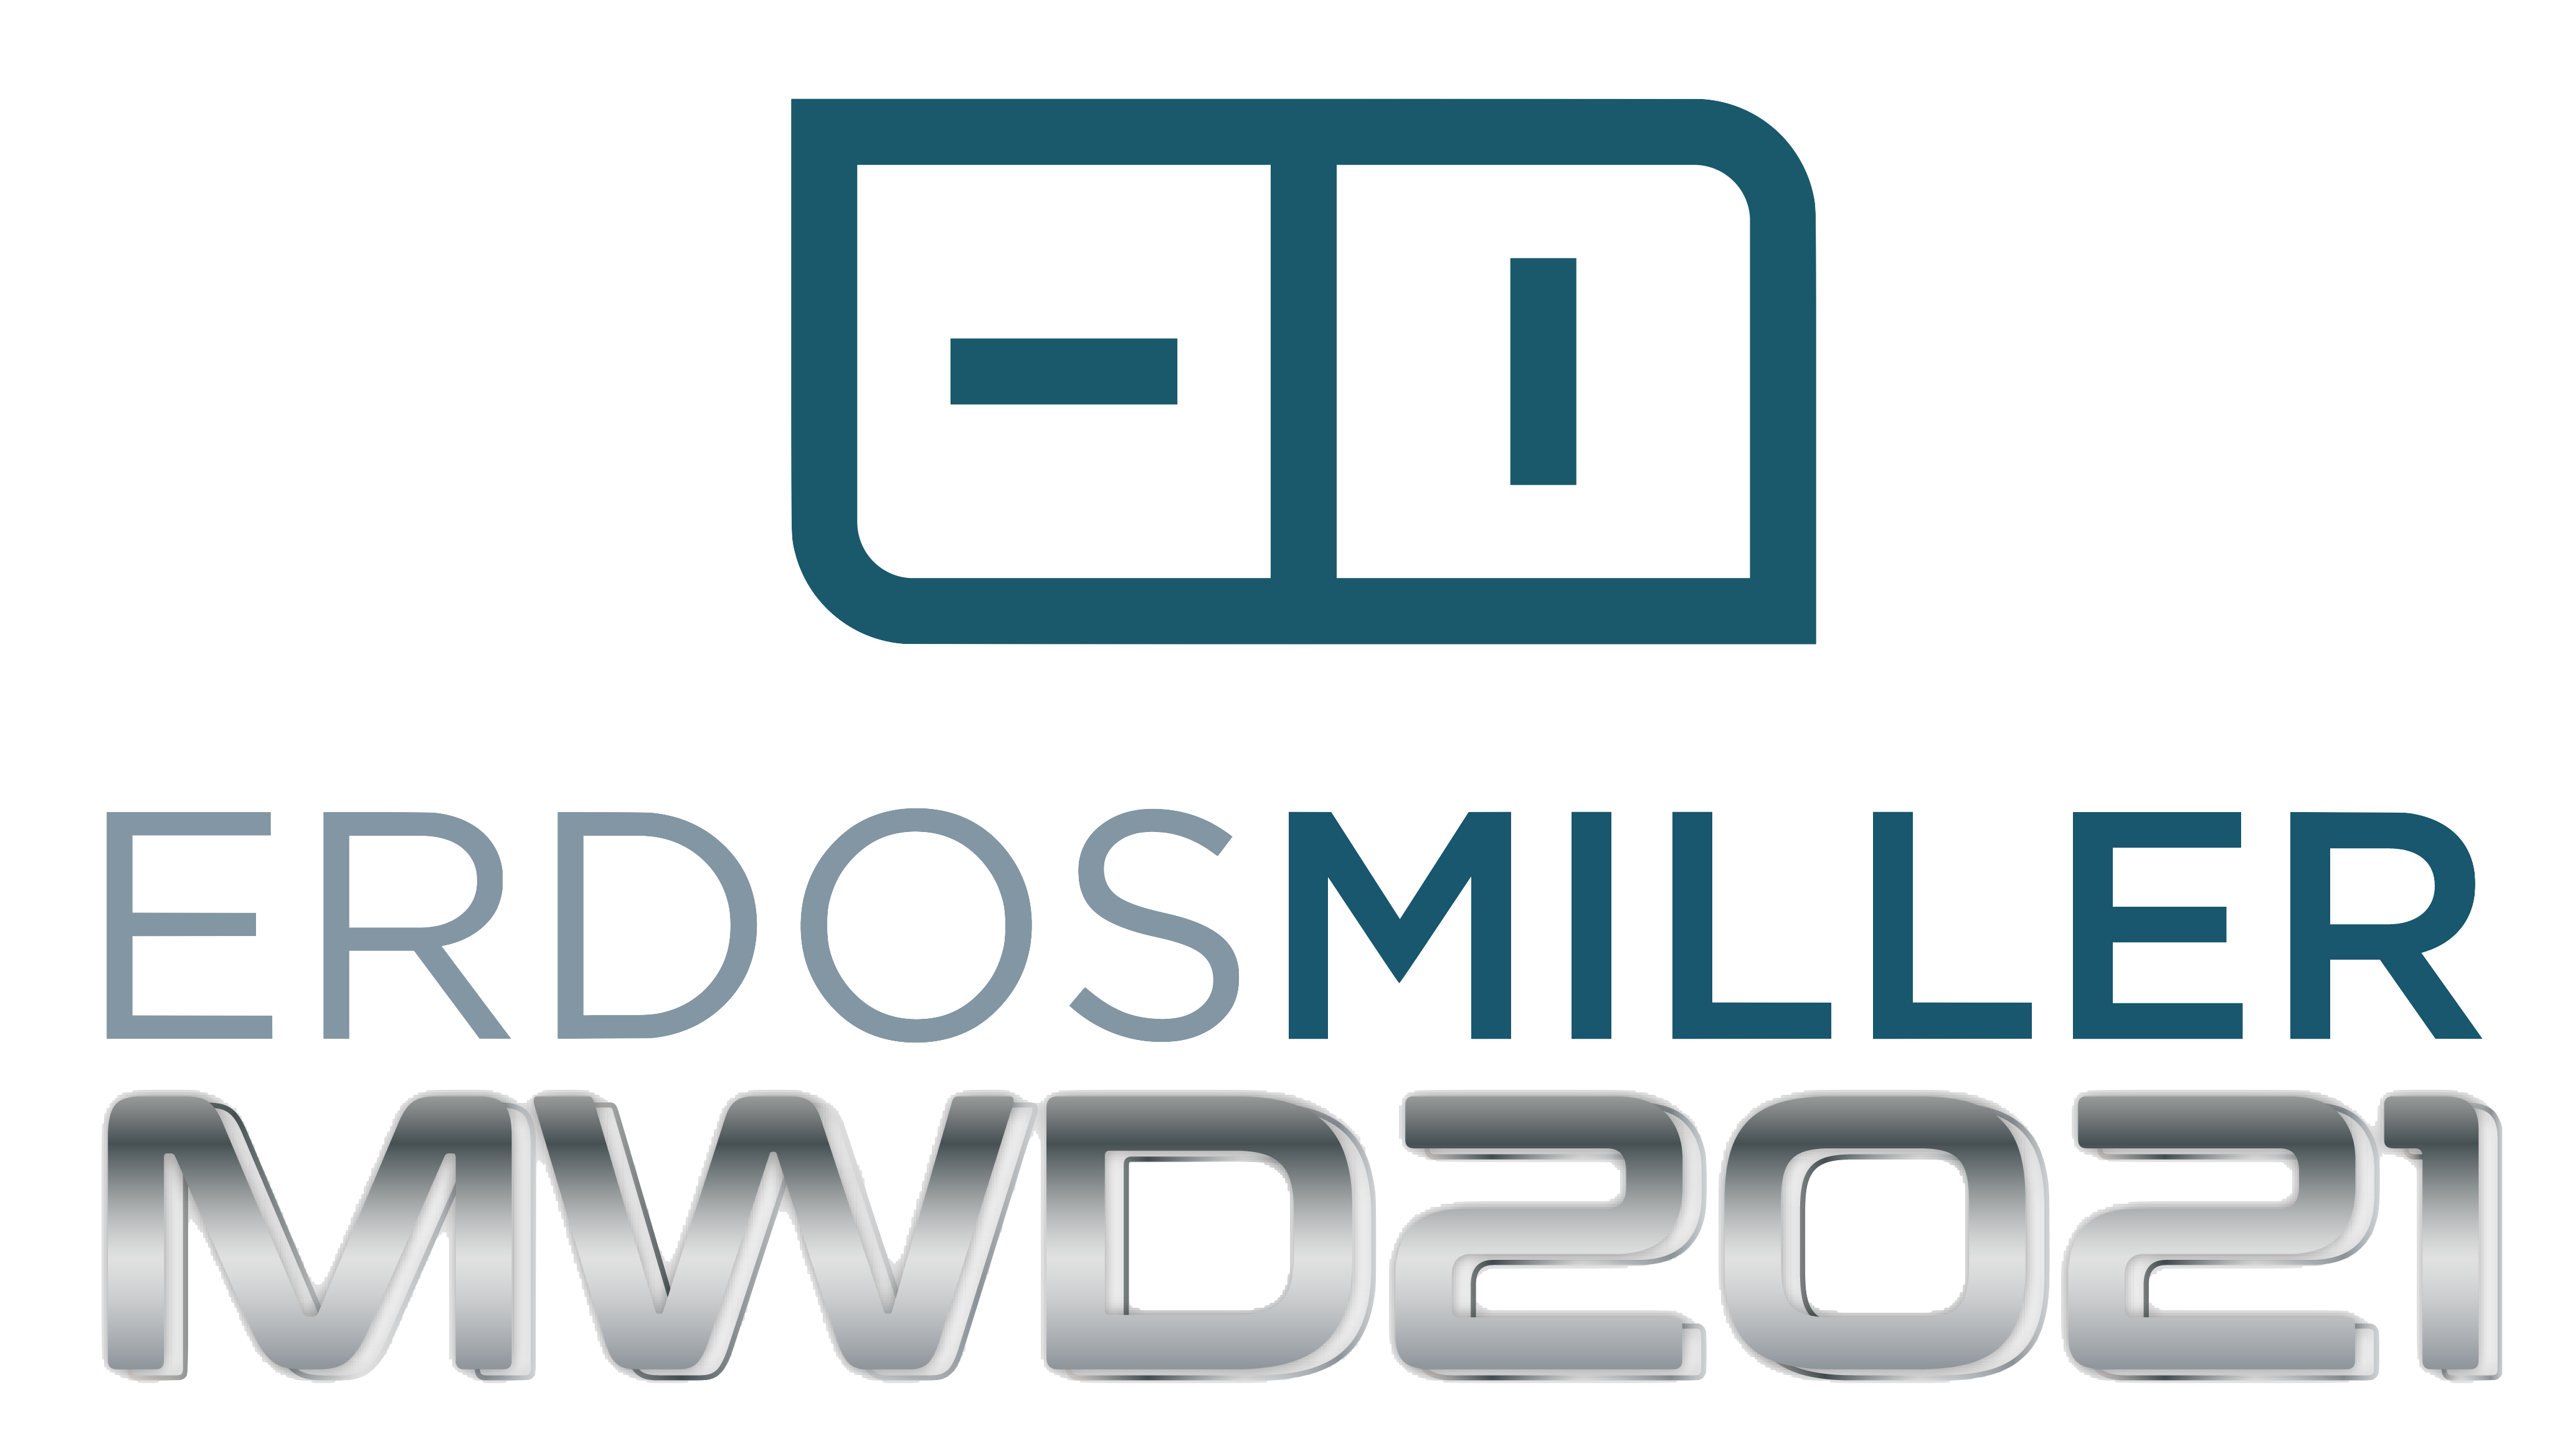 MWD2021 Erdos Miller